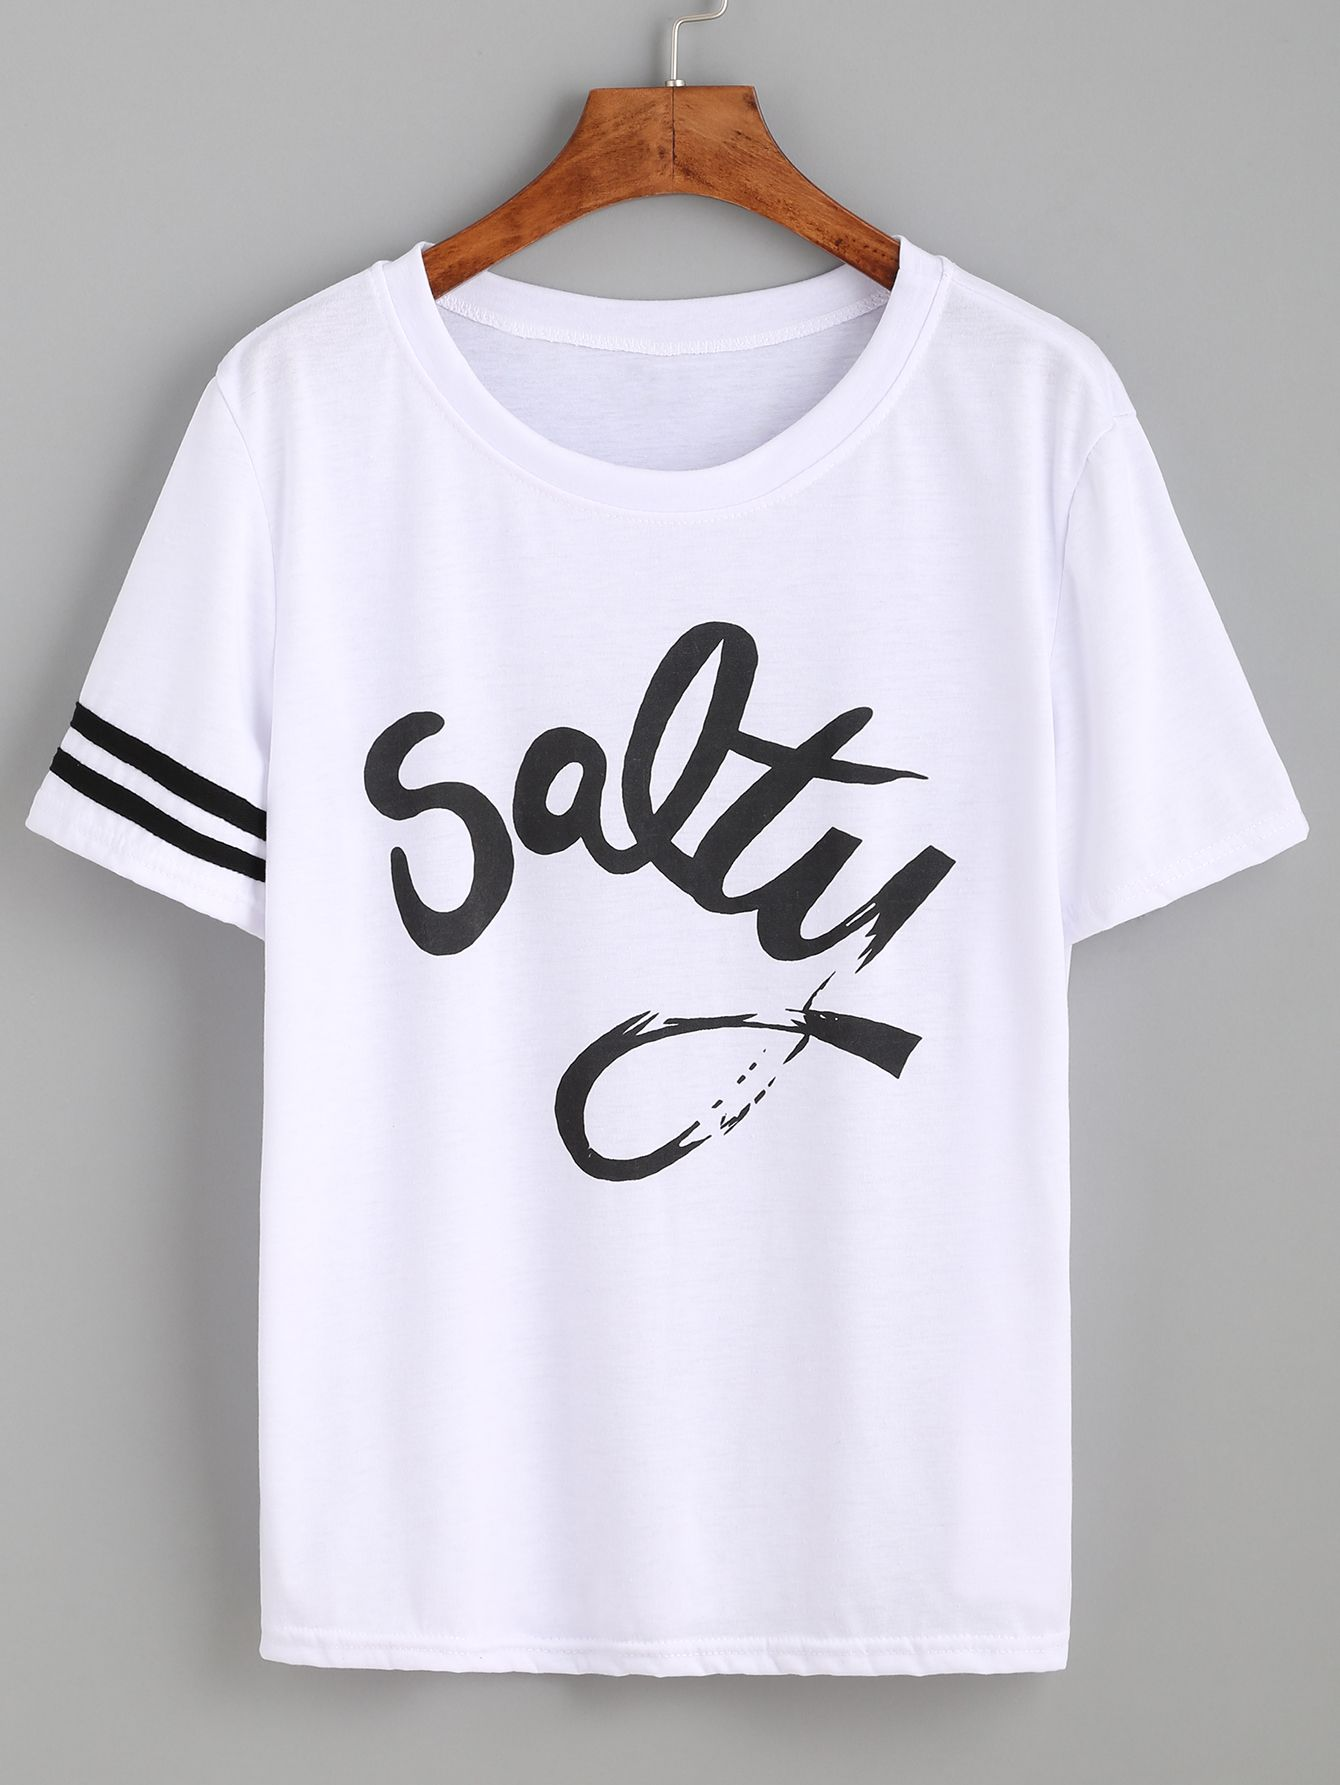 Pin By Oldcuts On T Shirt Design Shirts T Shirt Shirt Designs